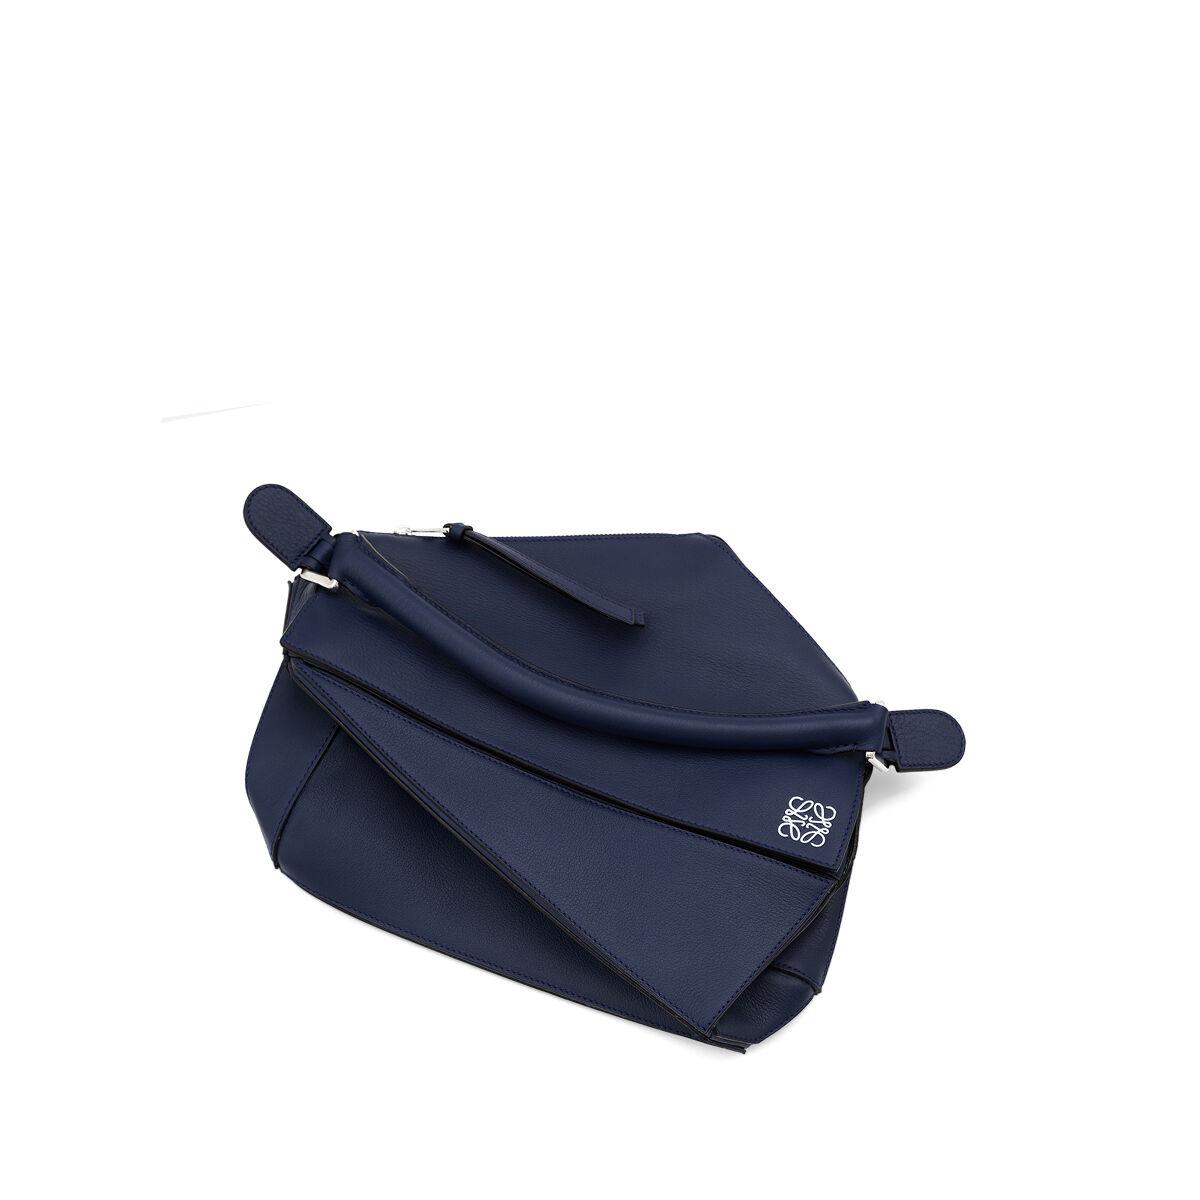 LOEWE Puzzle Bag 海军蓝 all